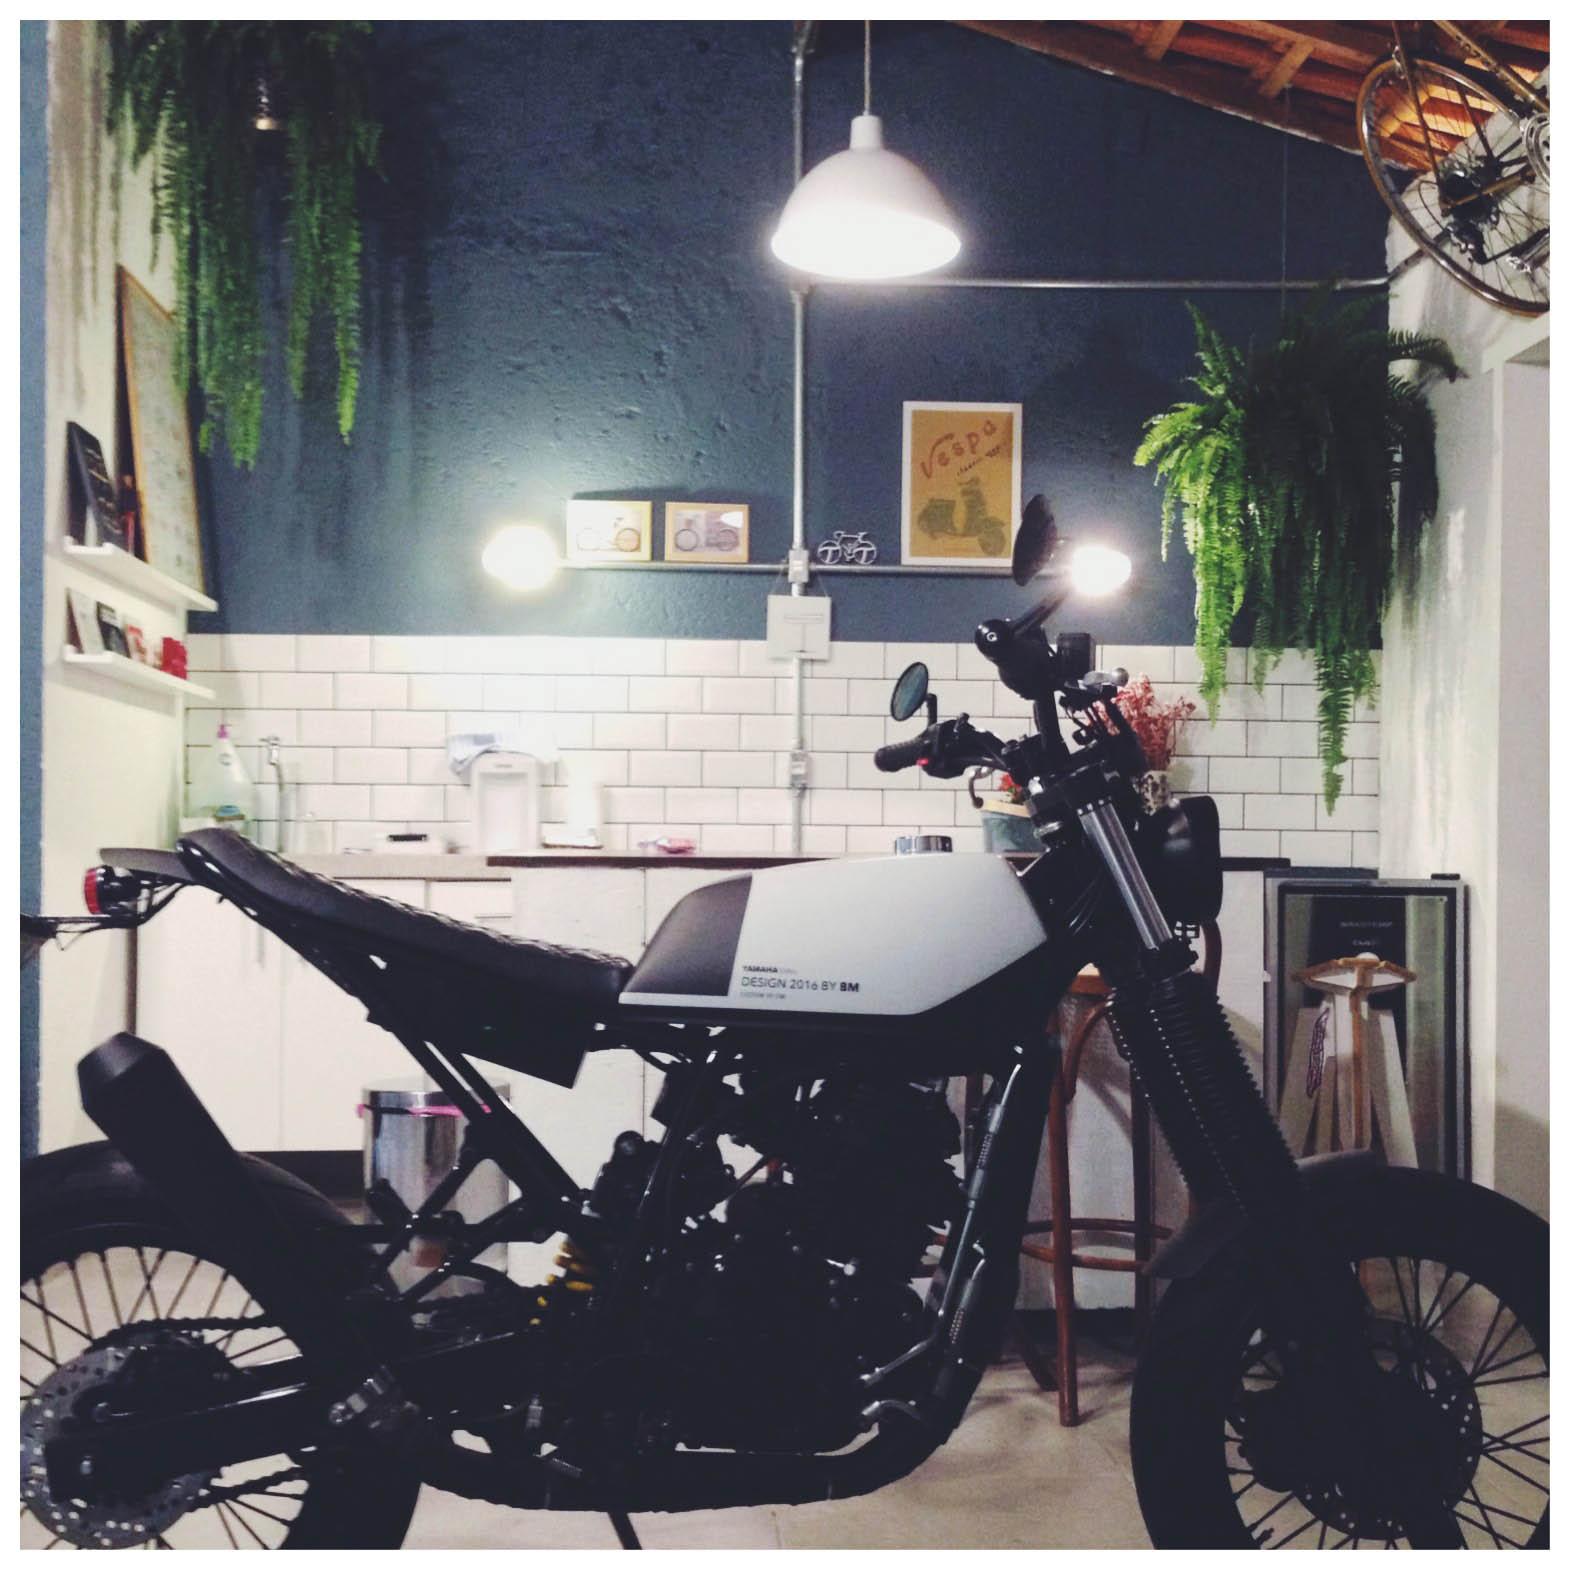 7 geral moto yamaha lander custom difere